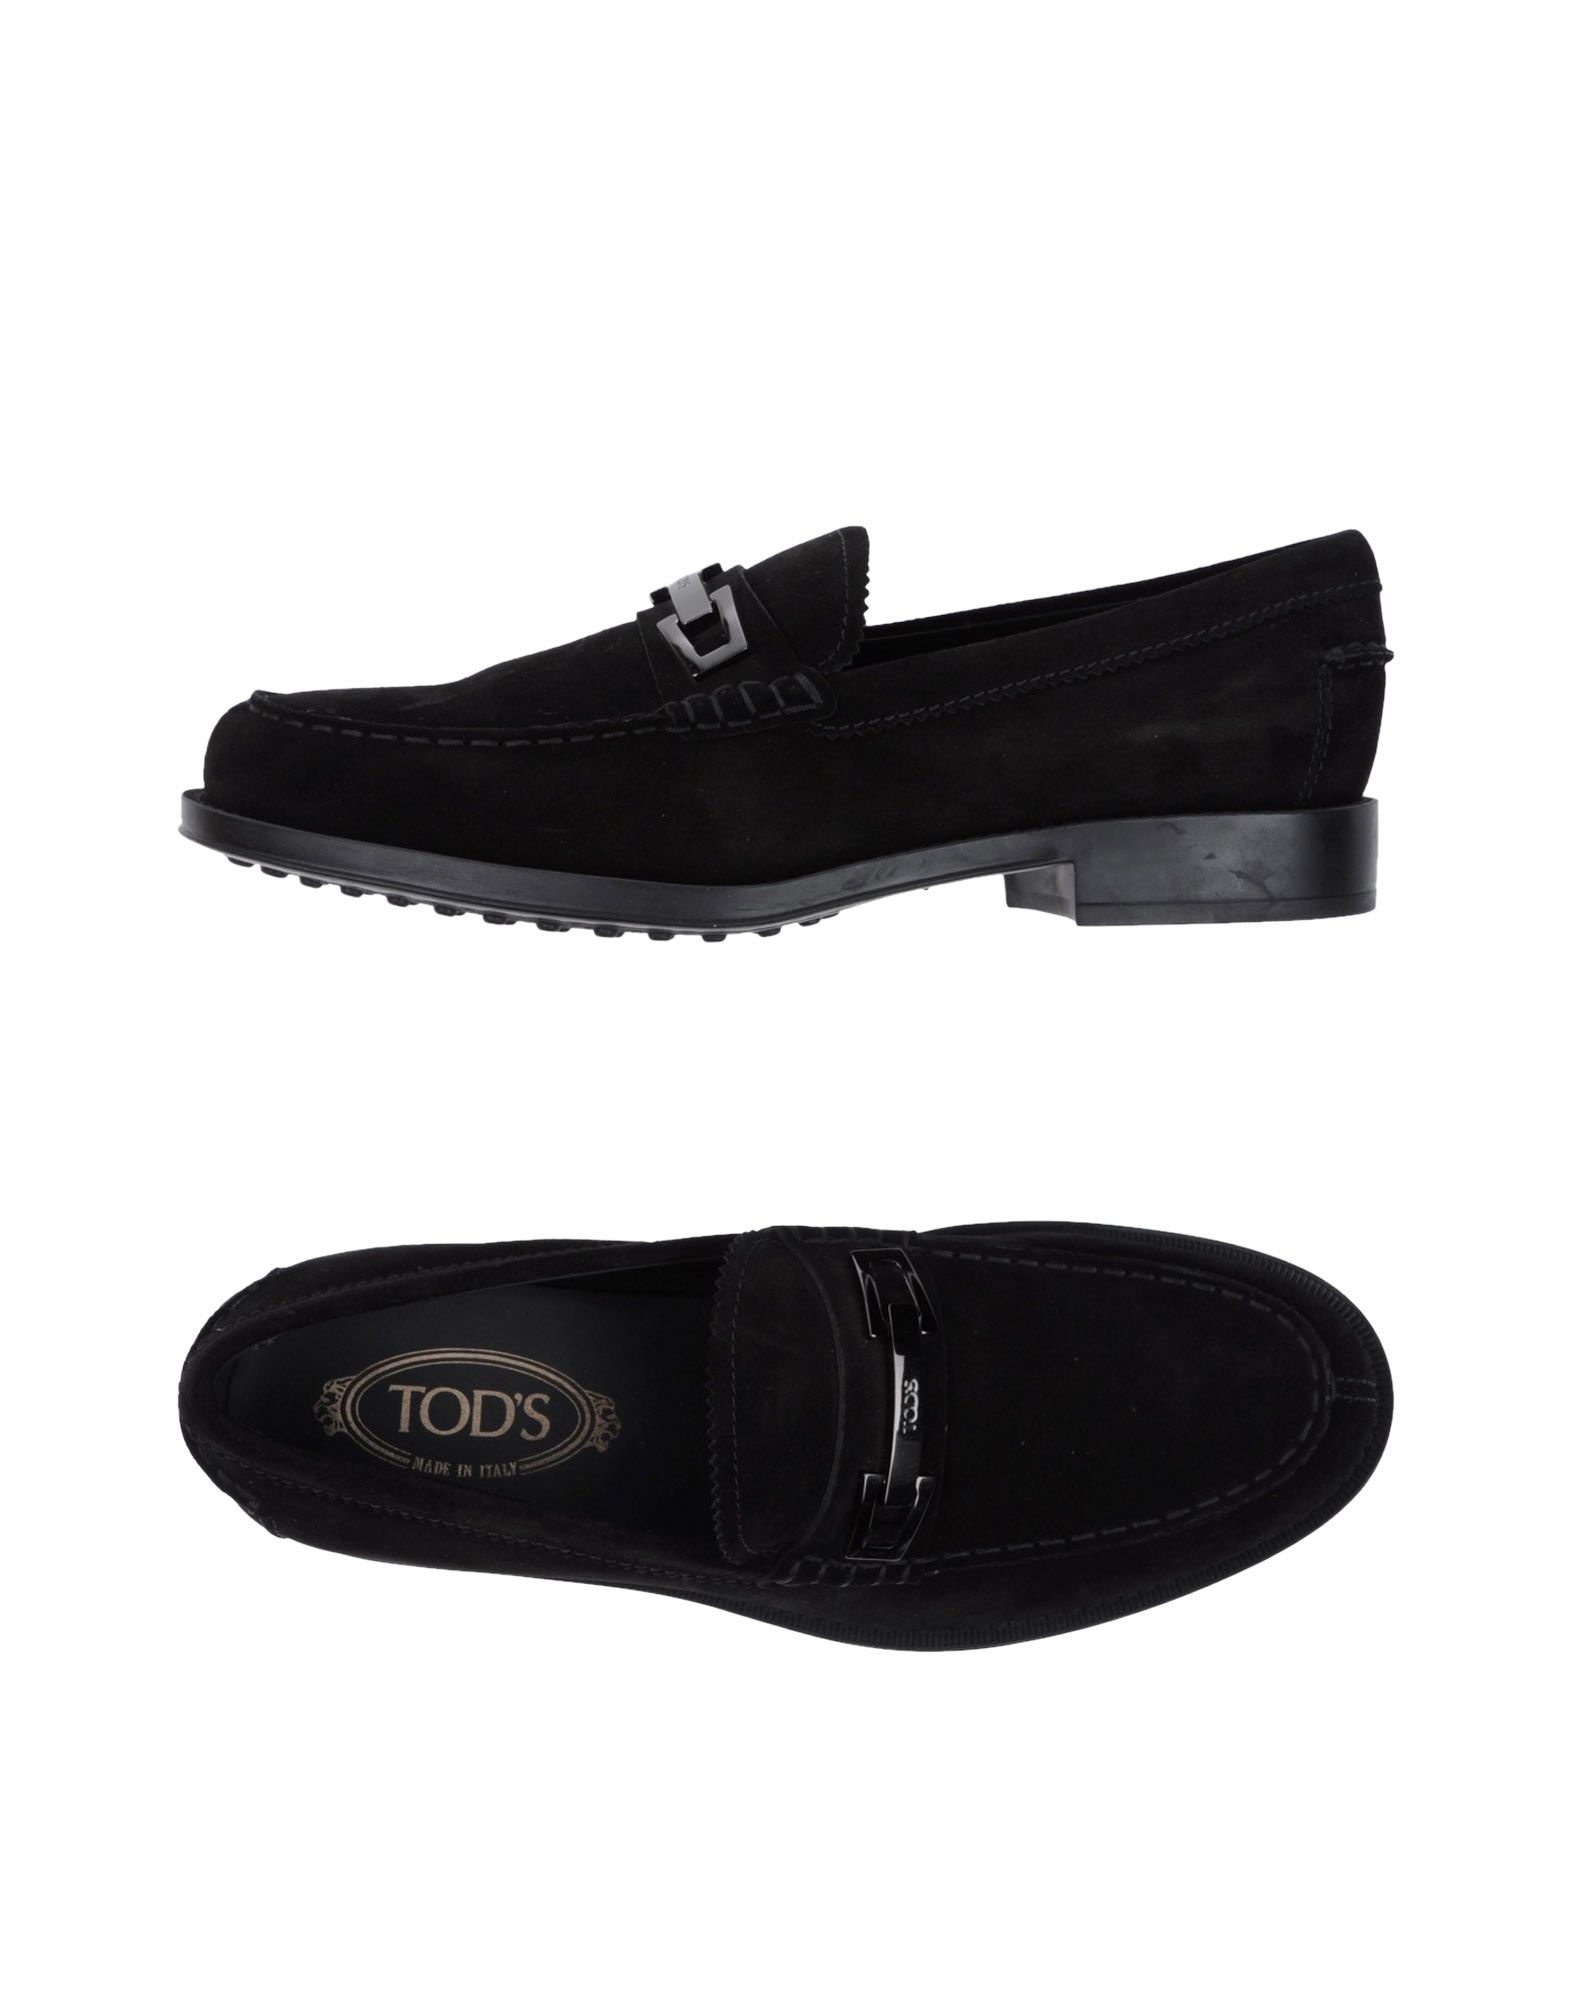 Tod's Mokassins Herren  11300102EH Gute Qualität beliebte Schuhe